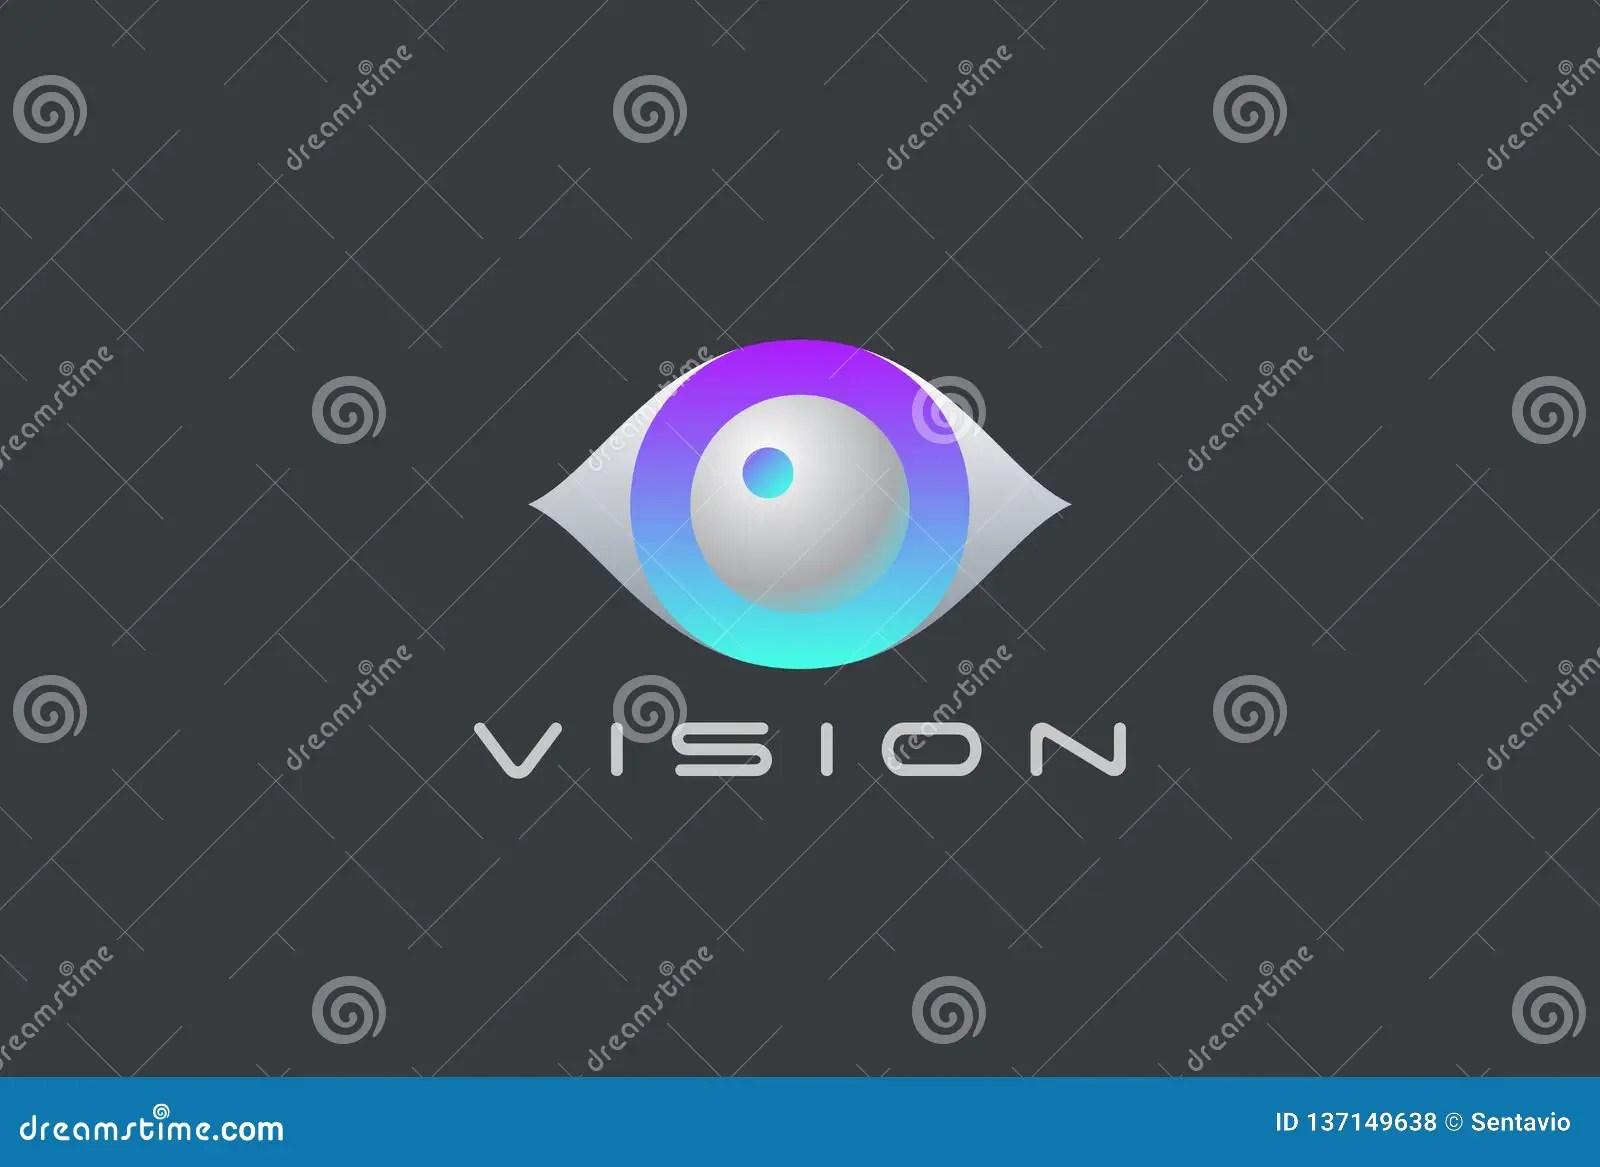 hight resolution of eye logo vision 3d design vector template security video photo optic lens spy virtual camera logotype concept icon